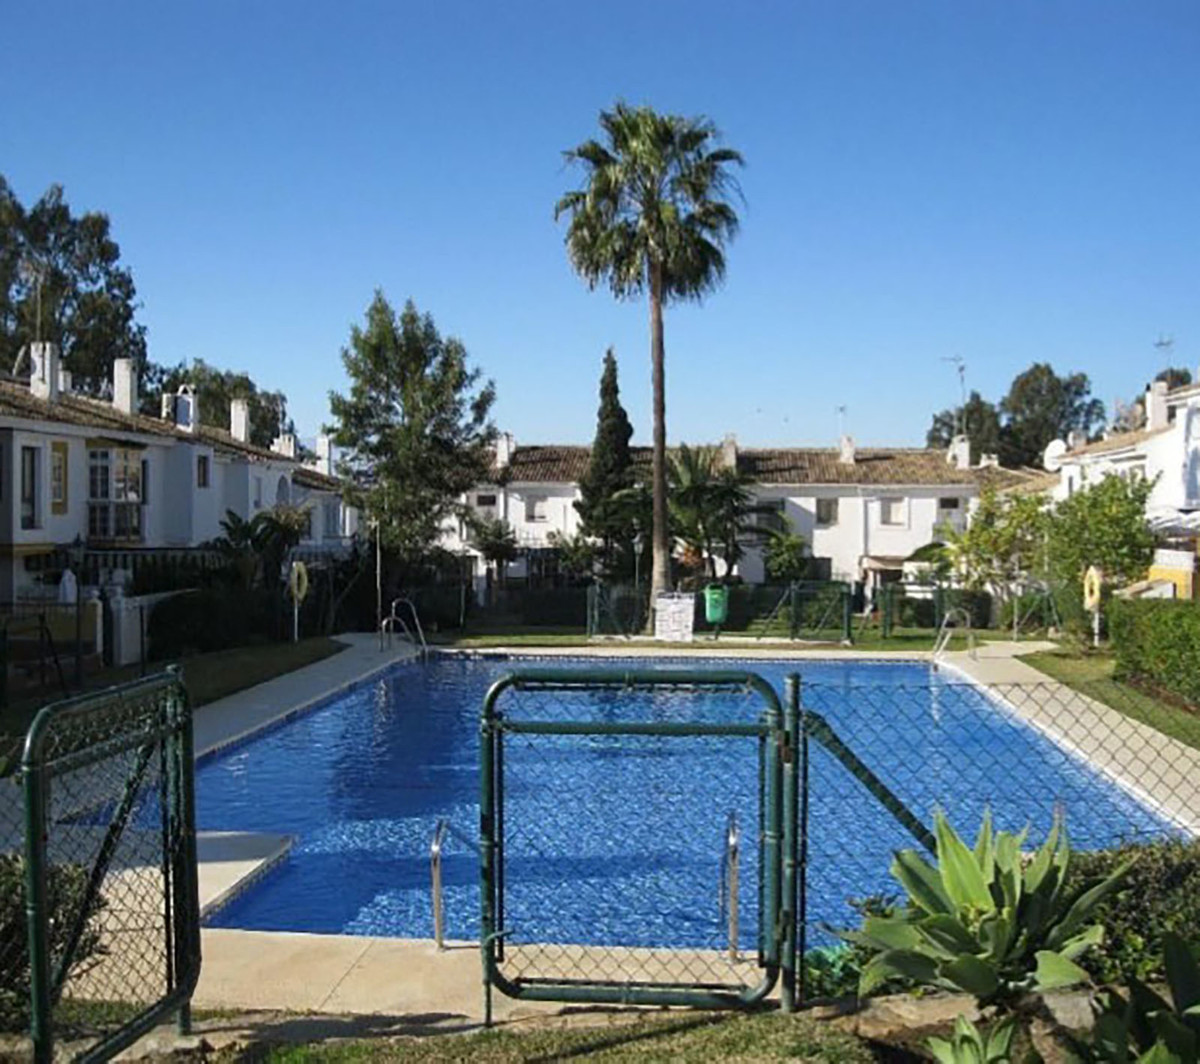 Casa - Málaga - R3842017 - mibgroup.es